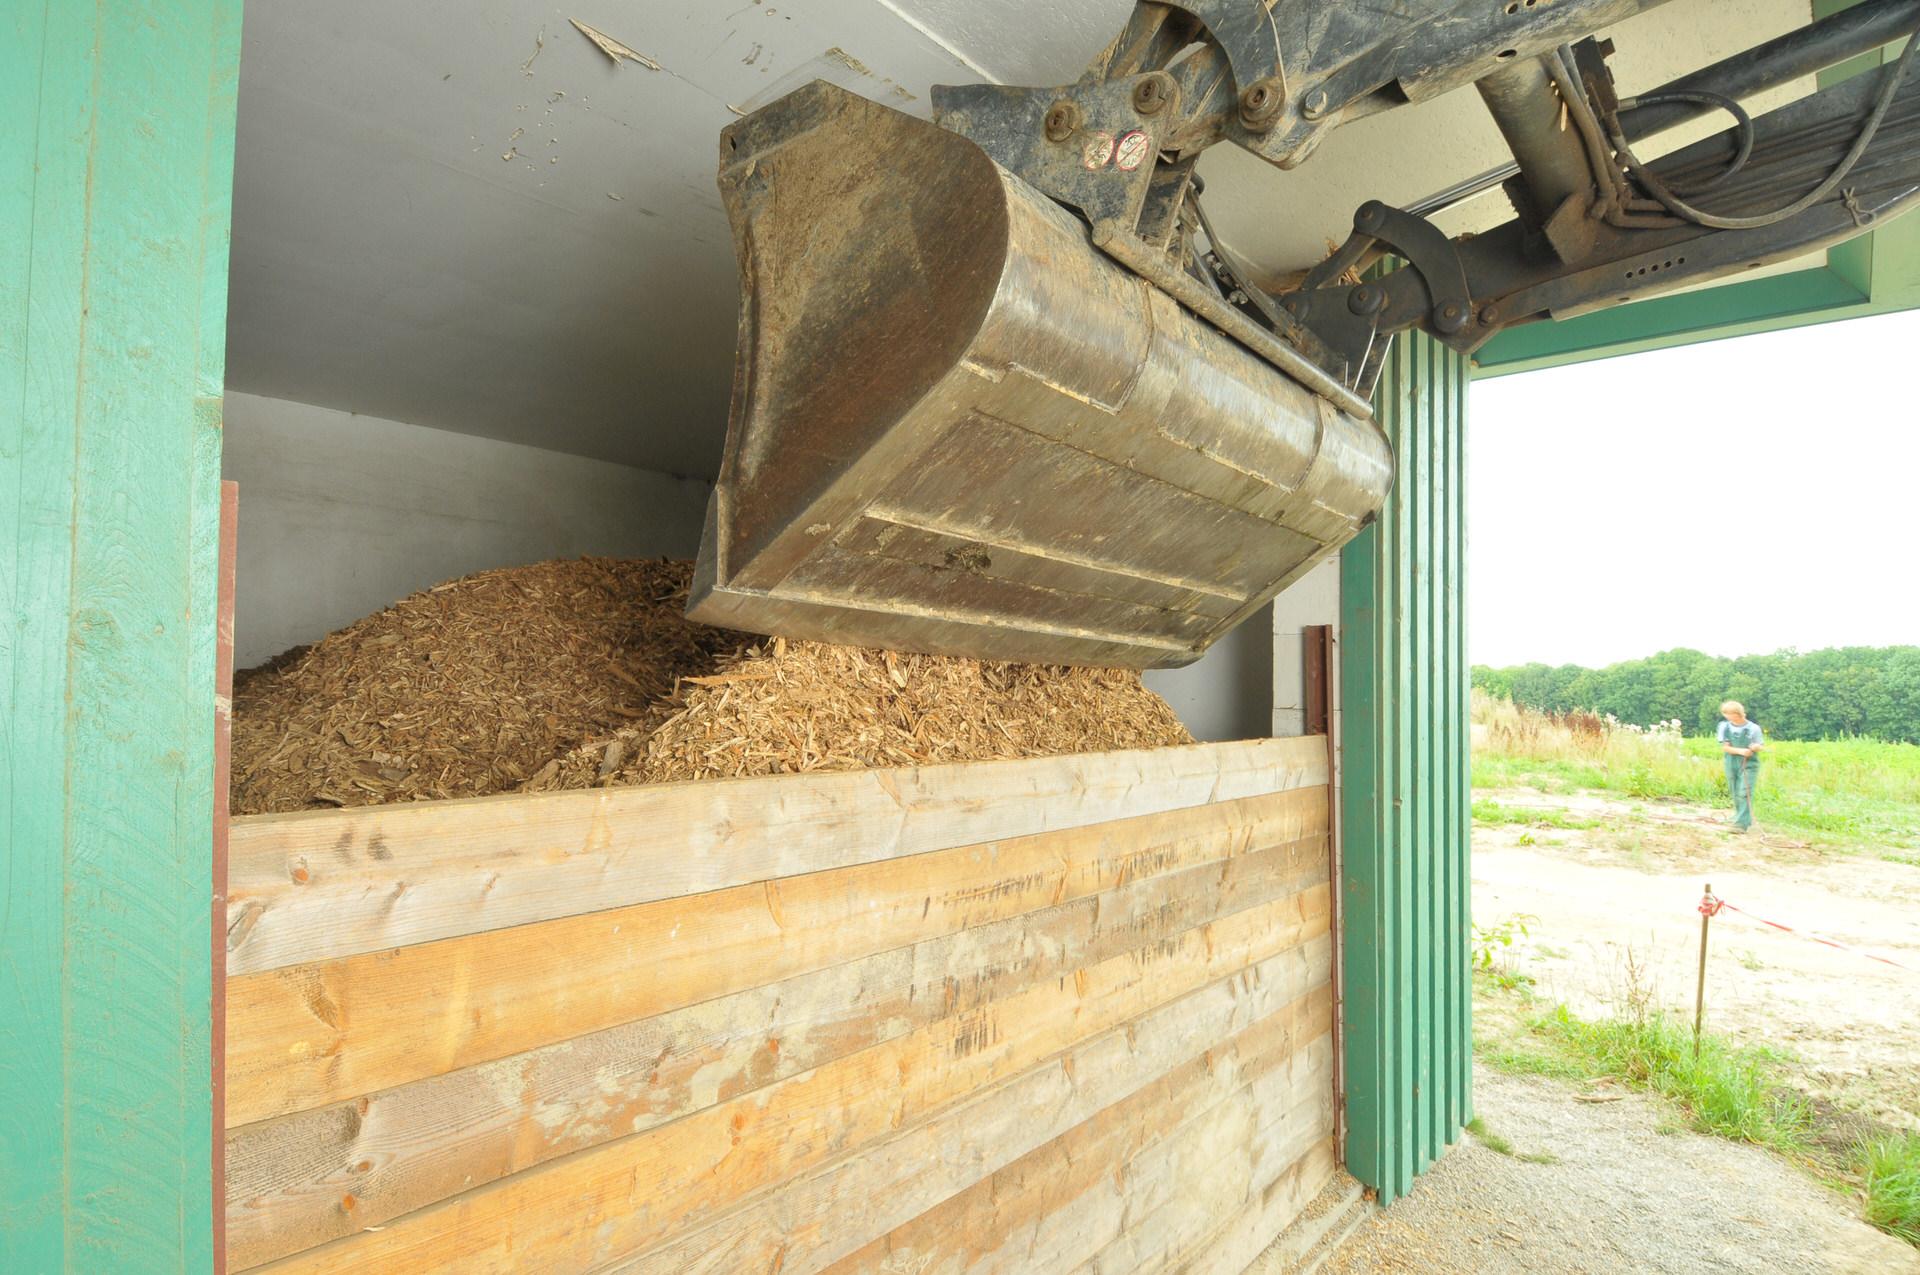 Holzhackschnitzelheizung